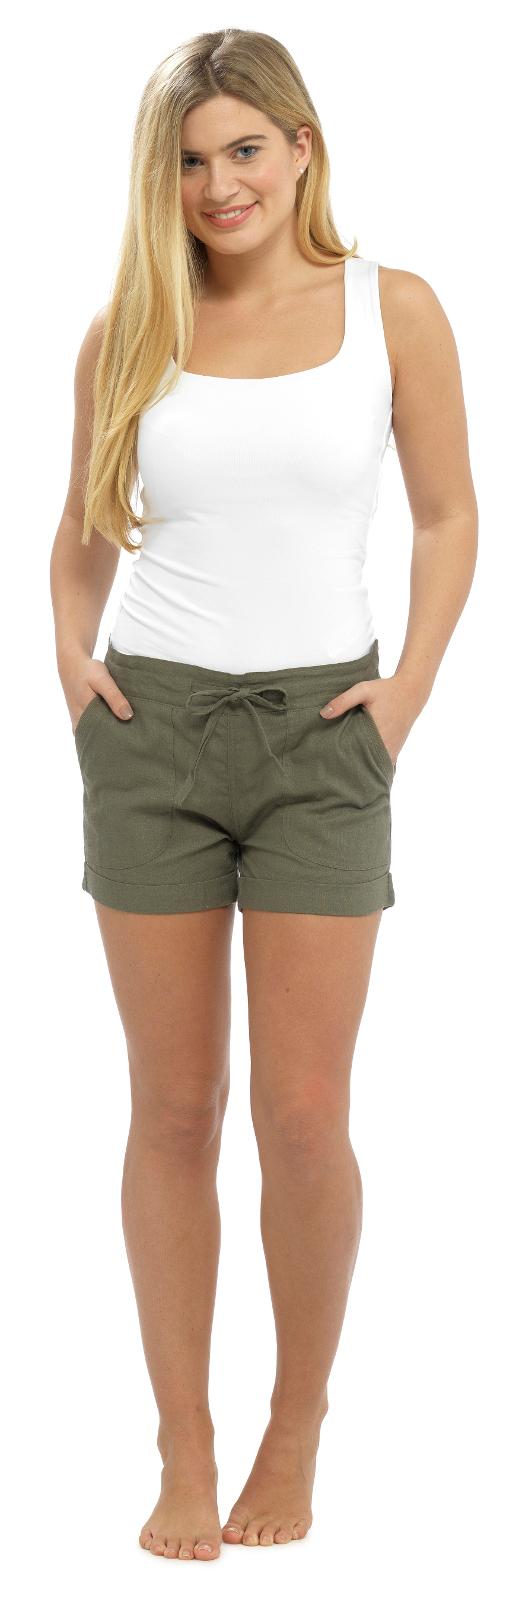 0de449a625919f Details about Womens Linen Shorts With Elasticated Waist Holiday Beach Hot  Pants Girls Size